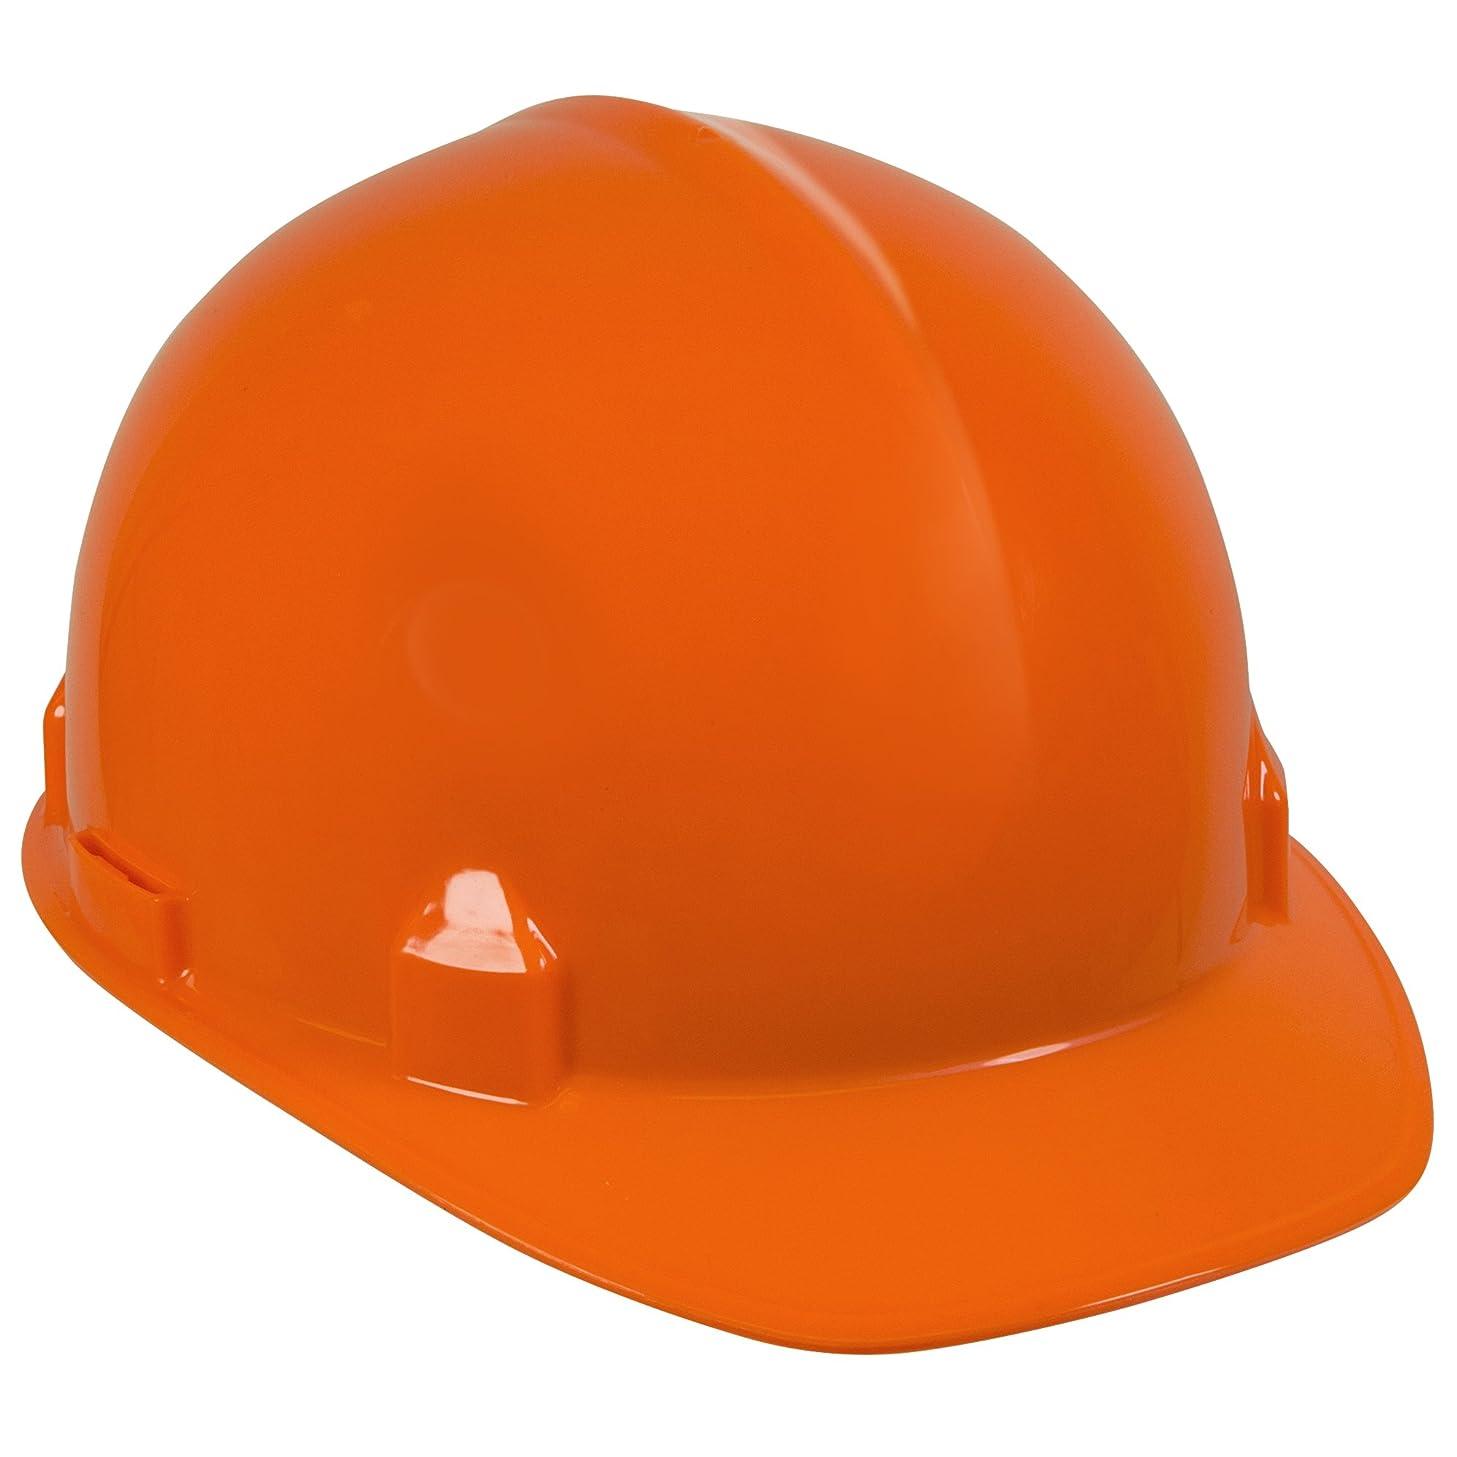 Jackson Safety SC-6 Hard Hat (14839), 4-Point Ratchet Suspension, Smooth Dome, Meets ANSI, Orange, 12 / Case